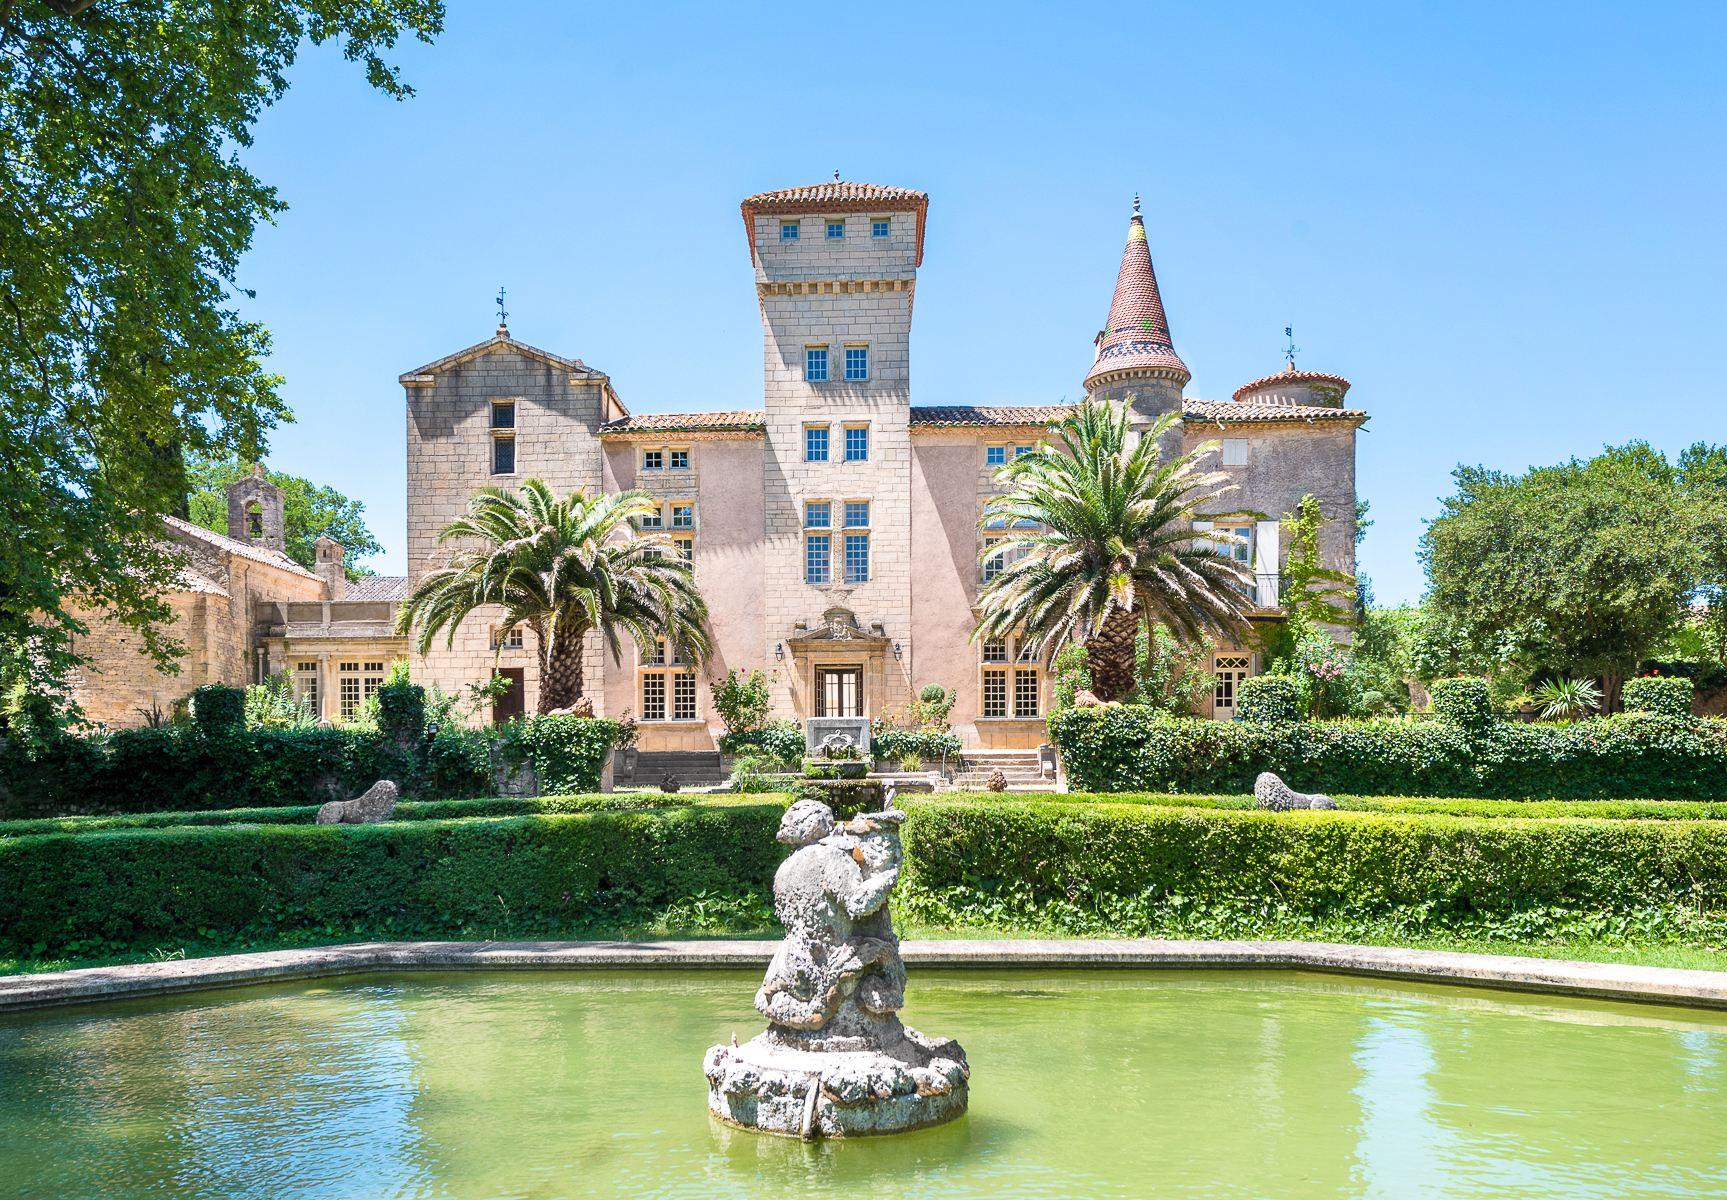 Villa per Vendita alle ore UNIQUE 165 HA WINERY CHATEAU FROM THE XIXTH CENTURY Montpellier, Languedoc-Roussillon, 34000 Francia